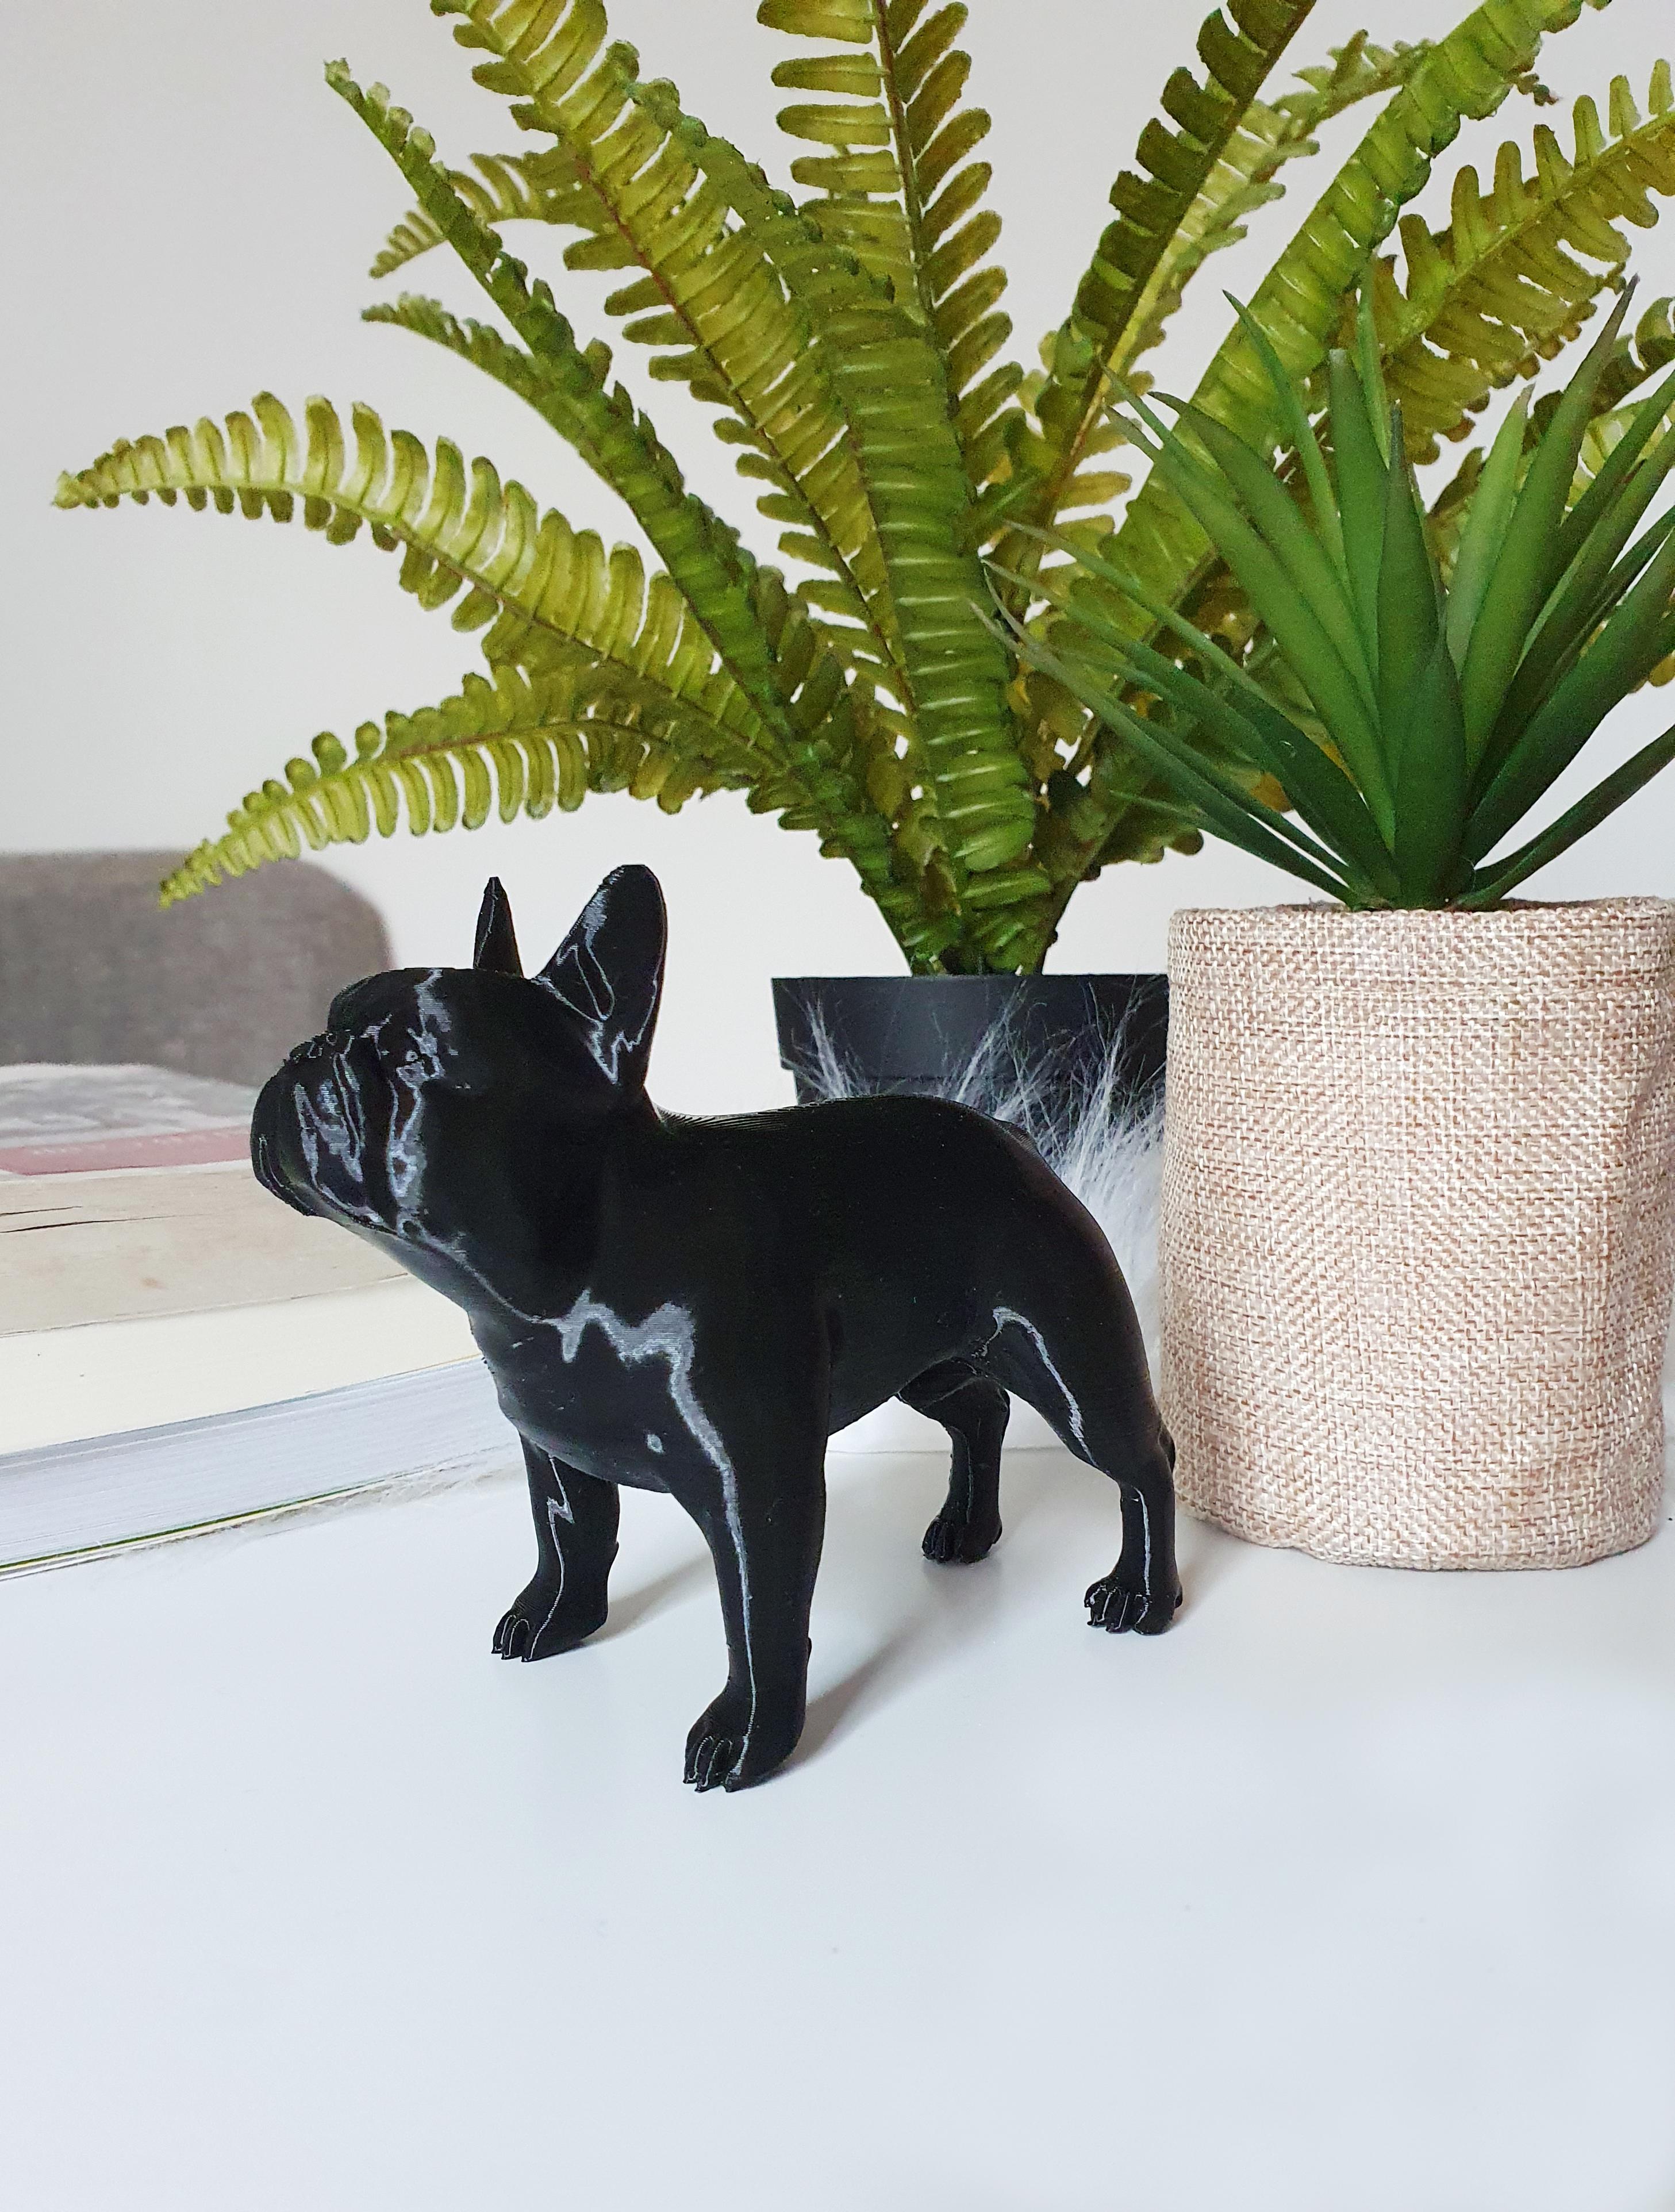 4.jpg Download free STL file Perro Bull Dog FRENCH BULLDOG DOG • 3D printable object, PRODUSTL56